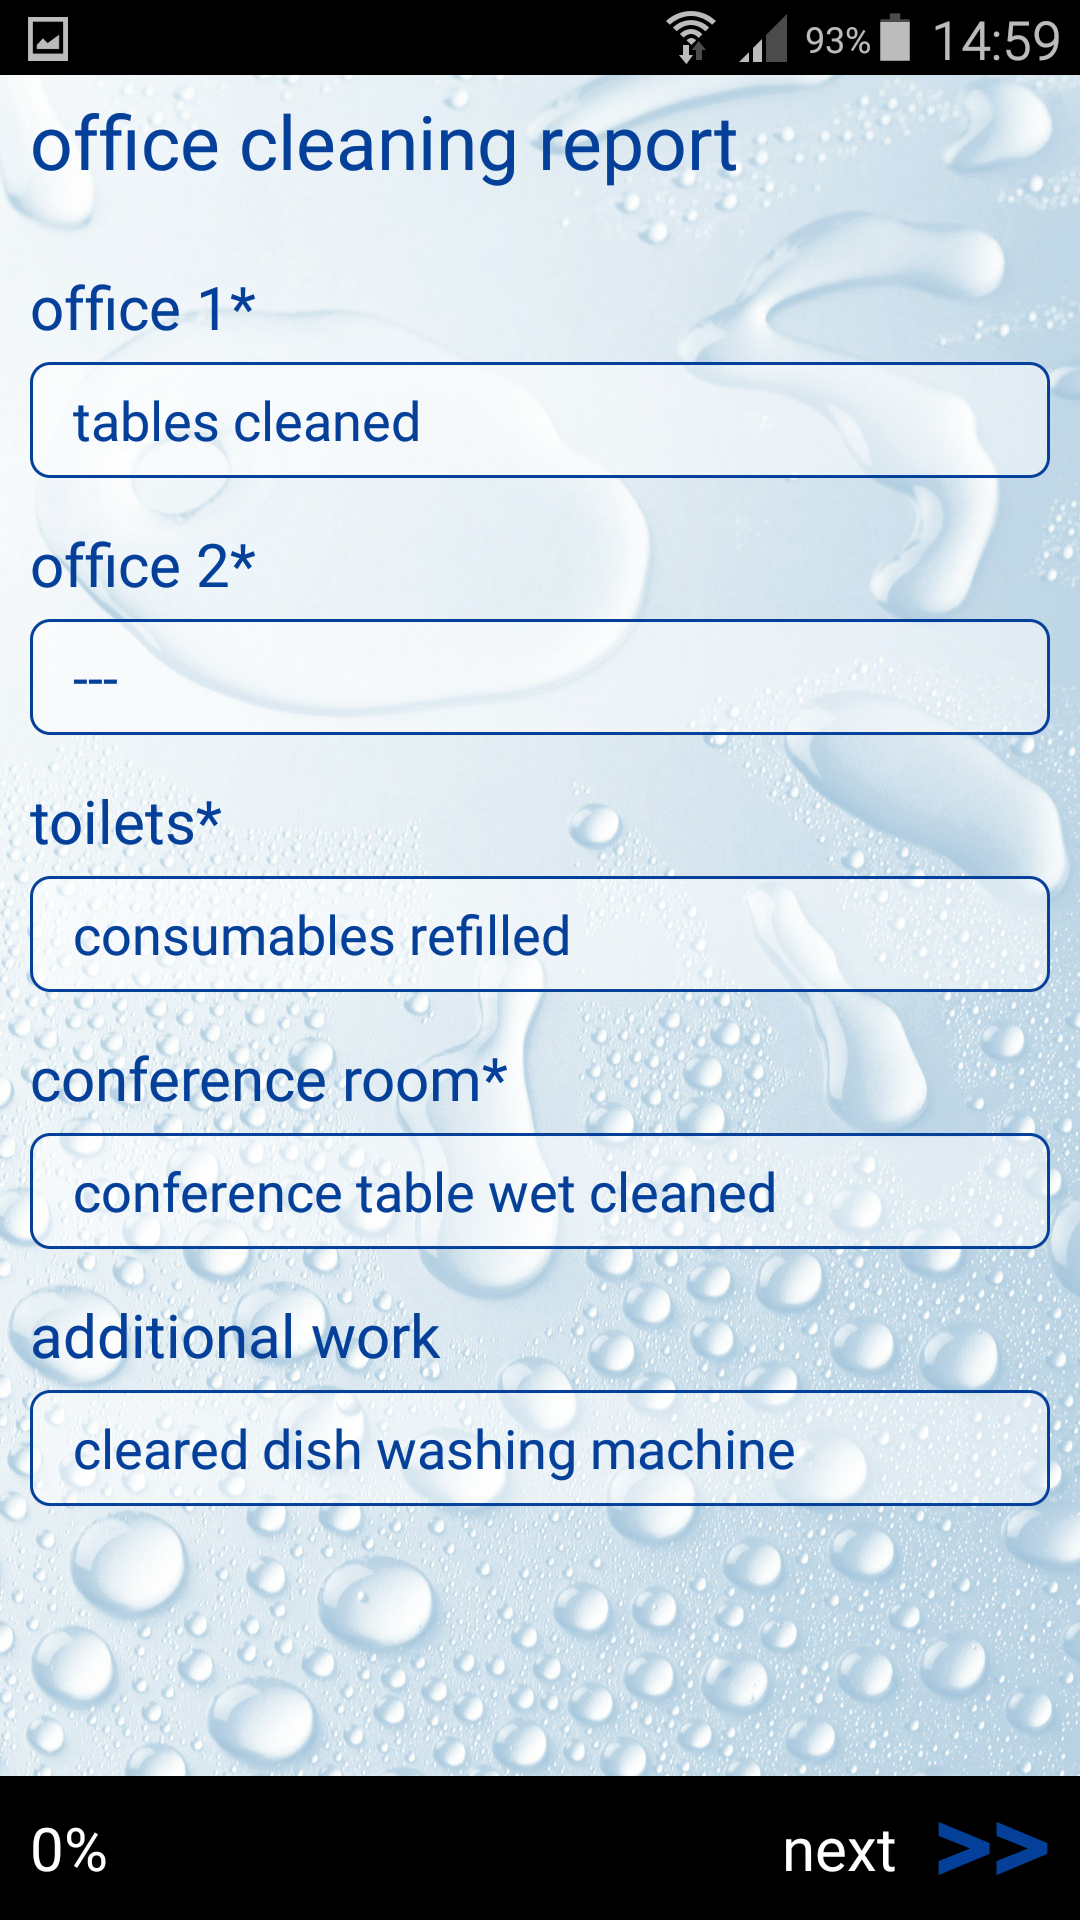 ginstr_app_officeCleaningReport_EN_3